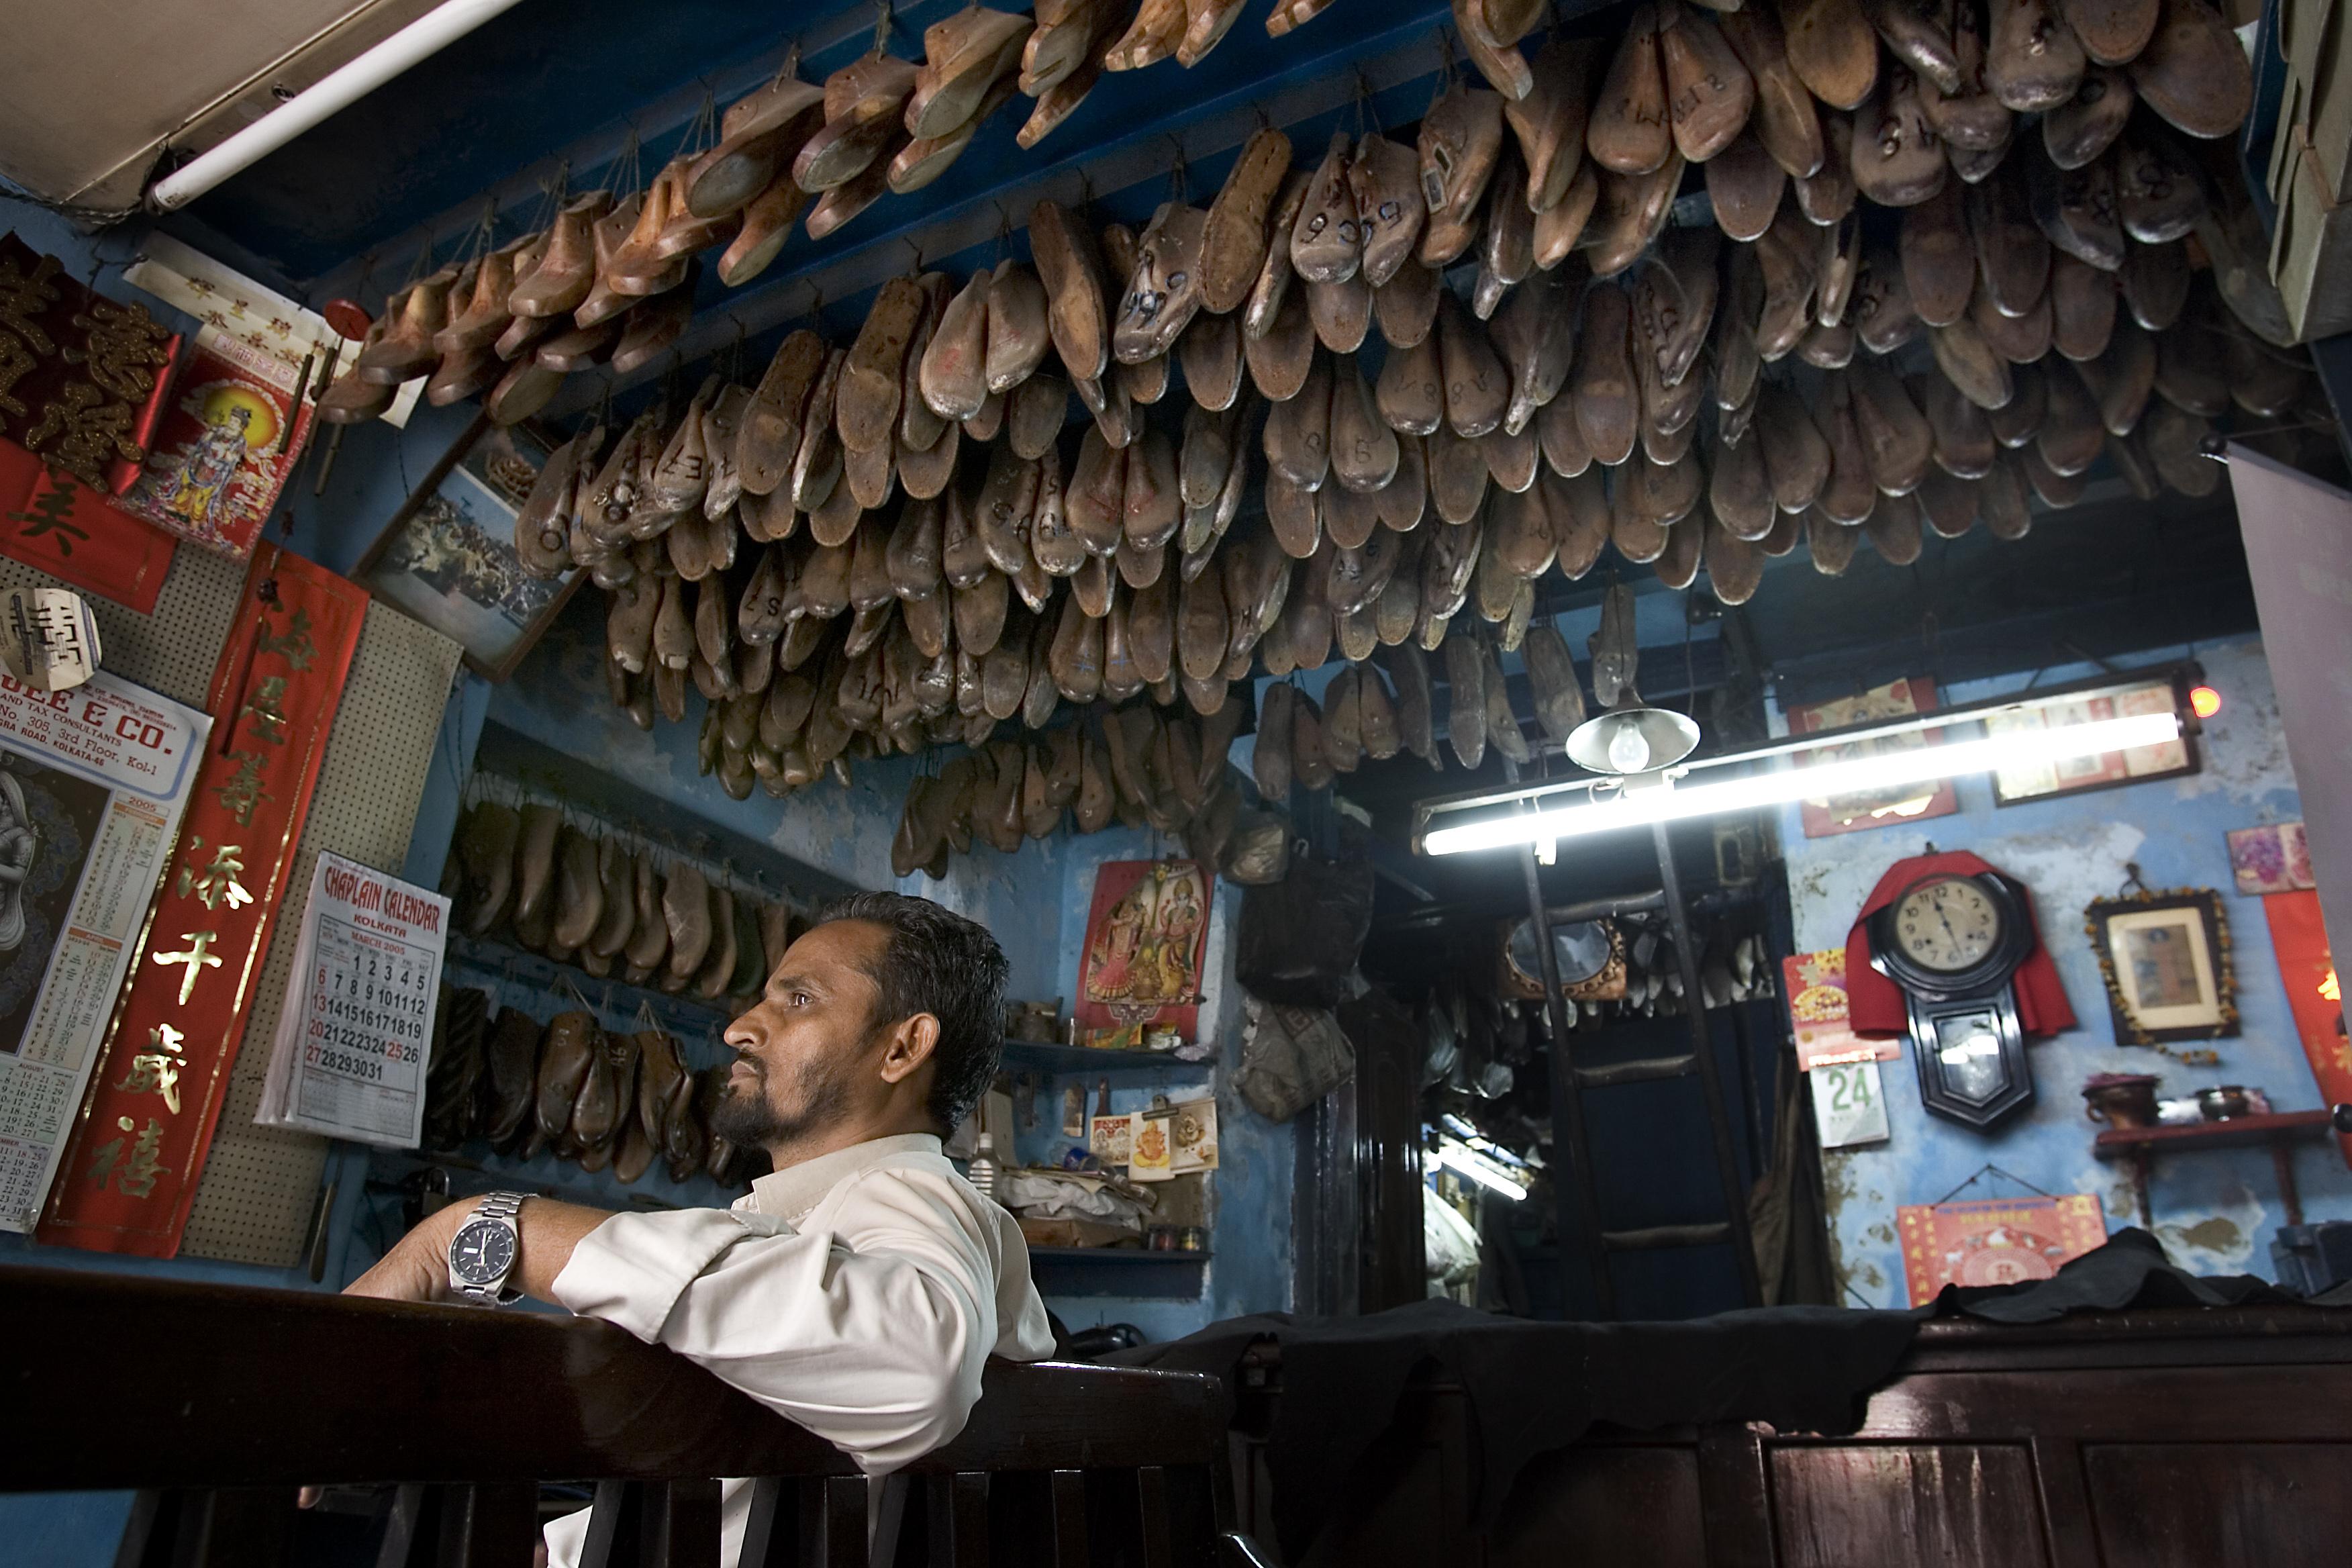 File:India - Kolkata shoe repair - 3979.jpg - Wikimedia ...